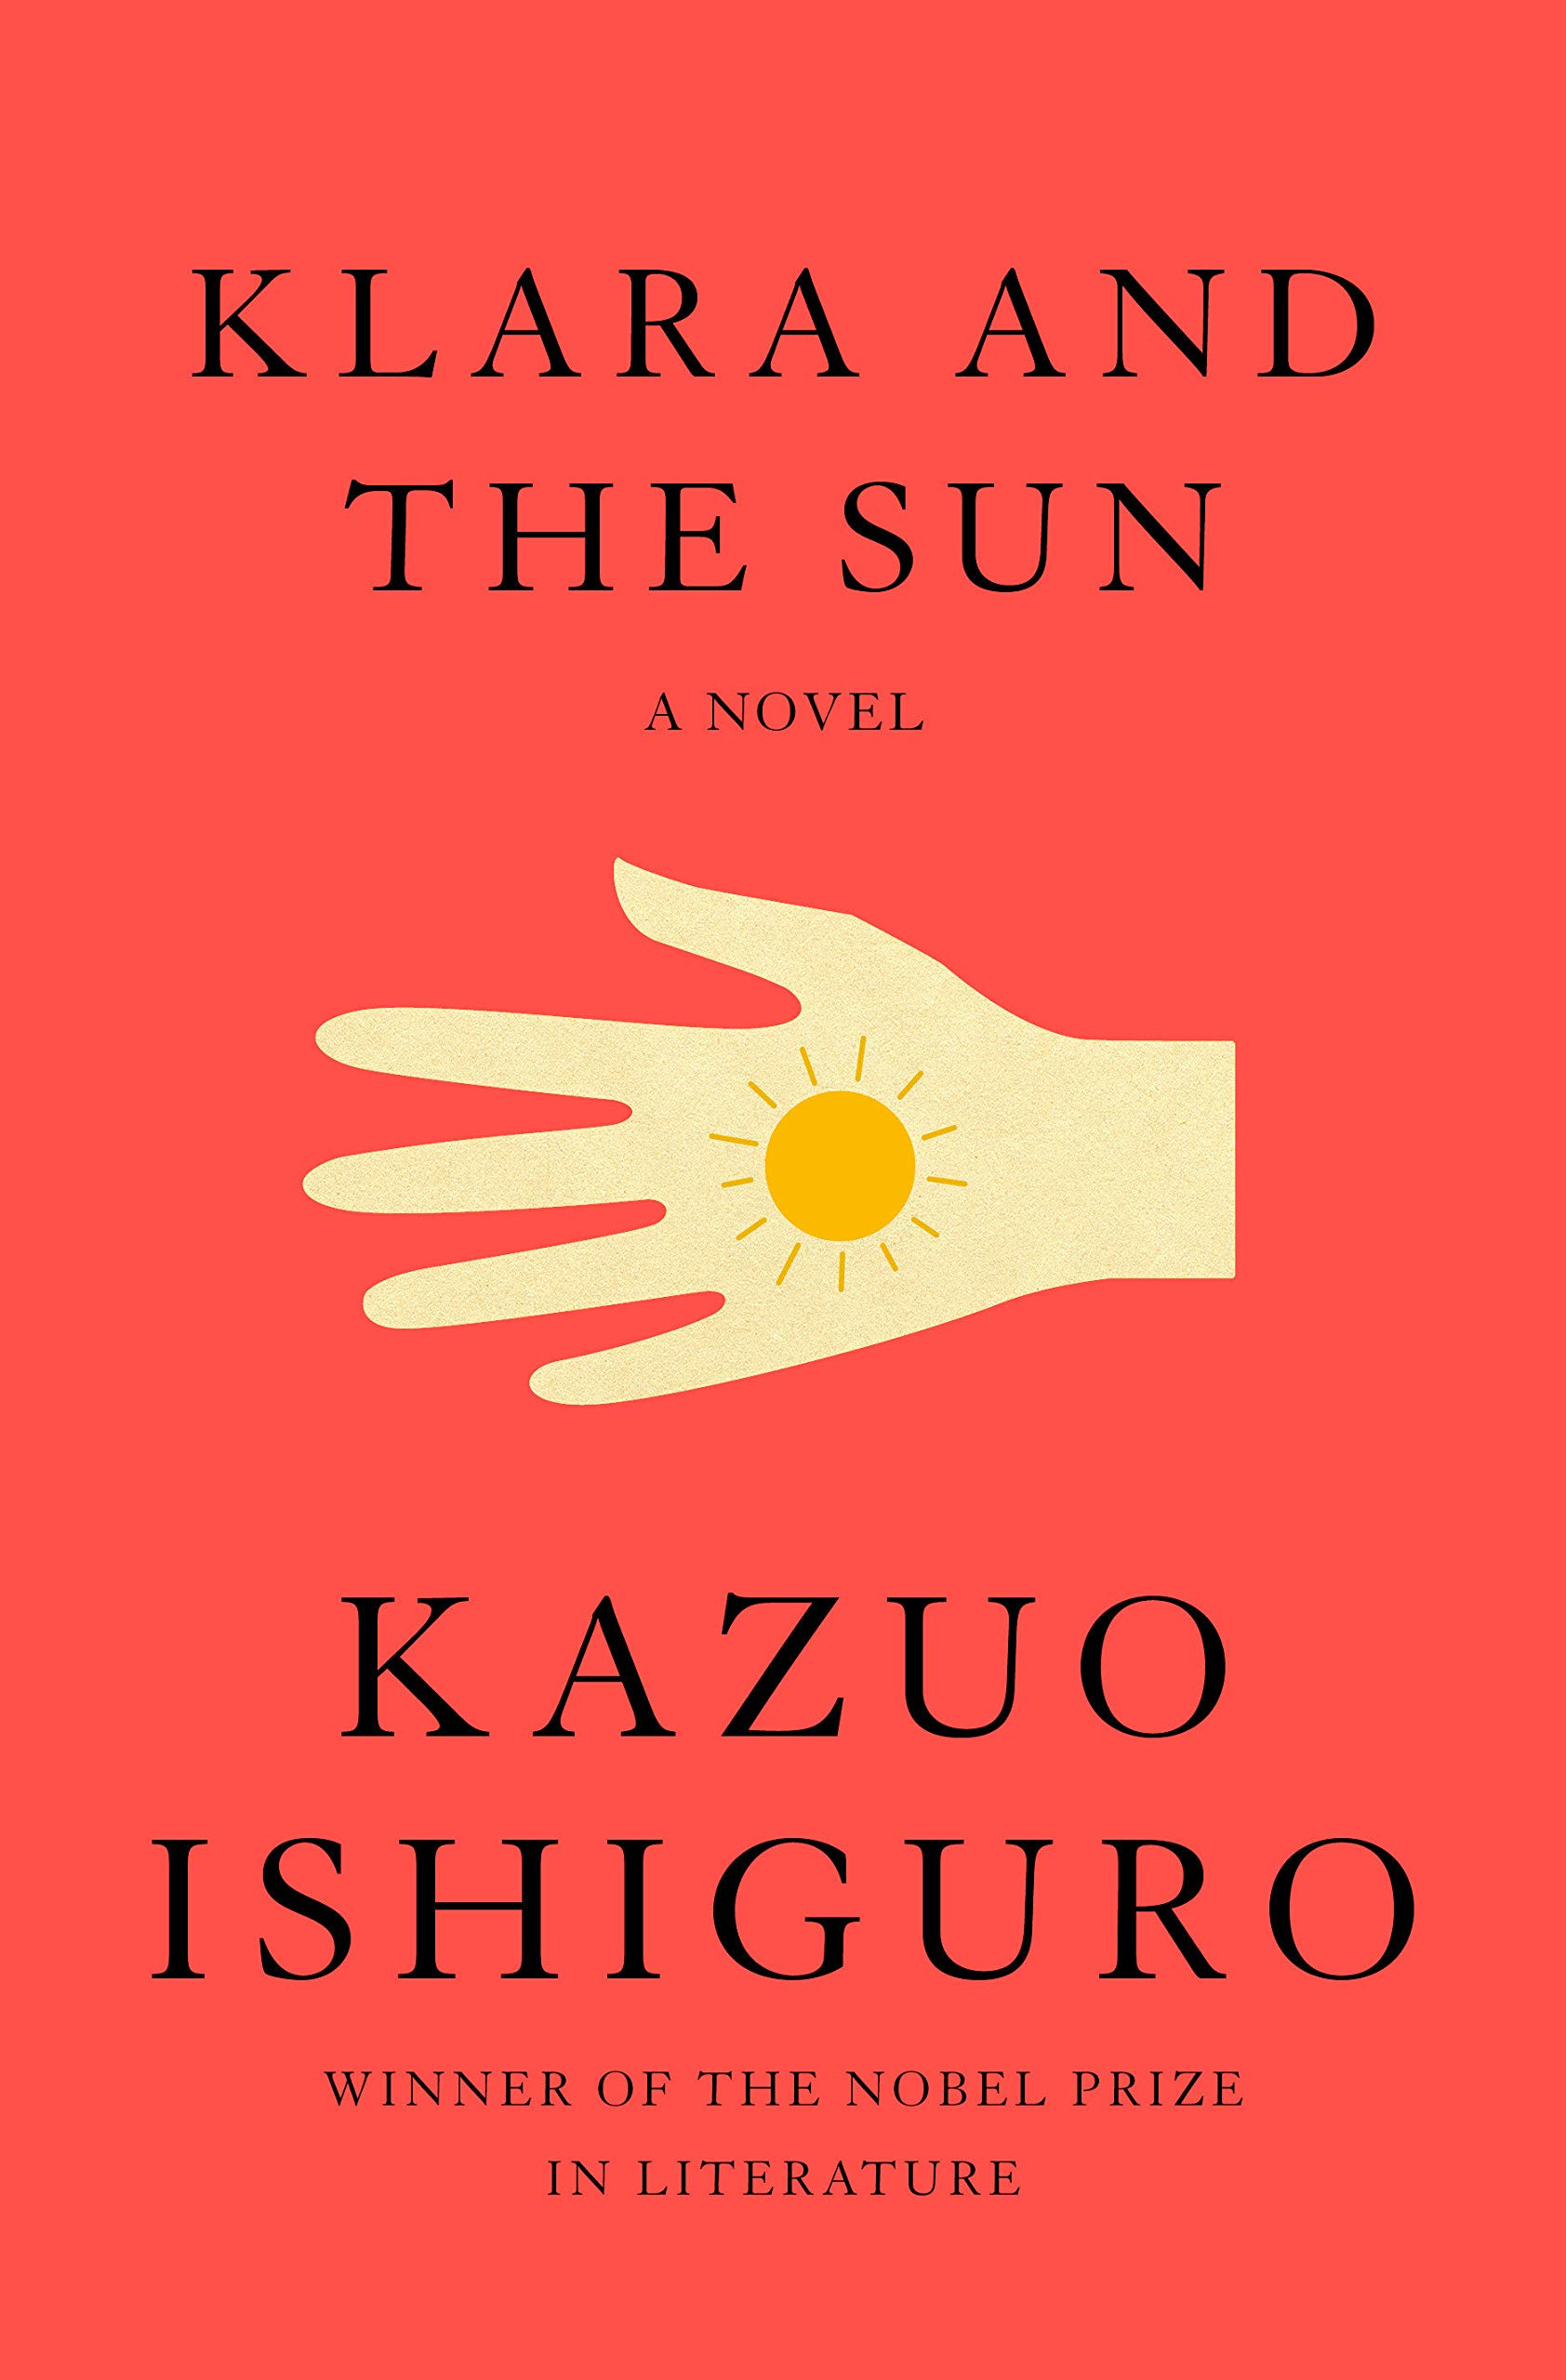 Klara and the Sun: A novel: Ishiguro, Kazuo: 9780593318171: Amazon.com: Books